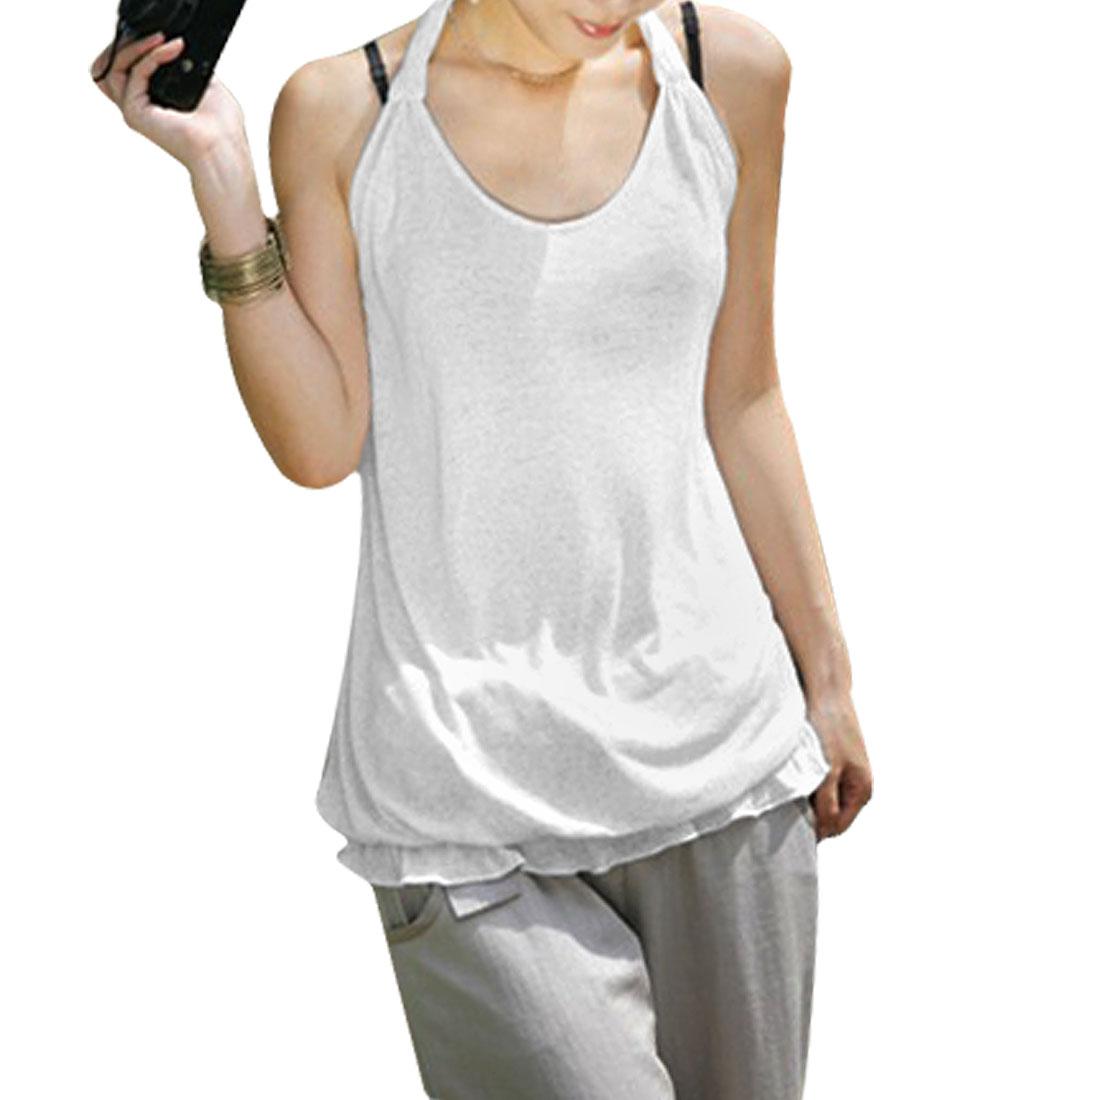 Ladies Light Gray Sleeveless Halter Neck Tank Top XS